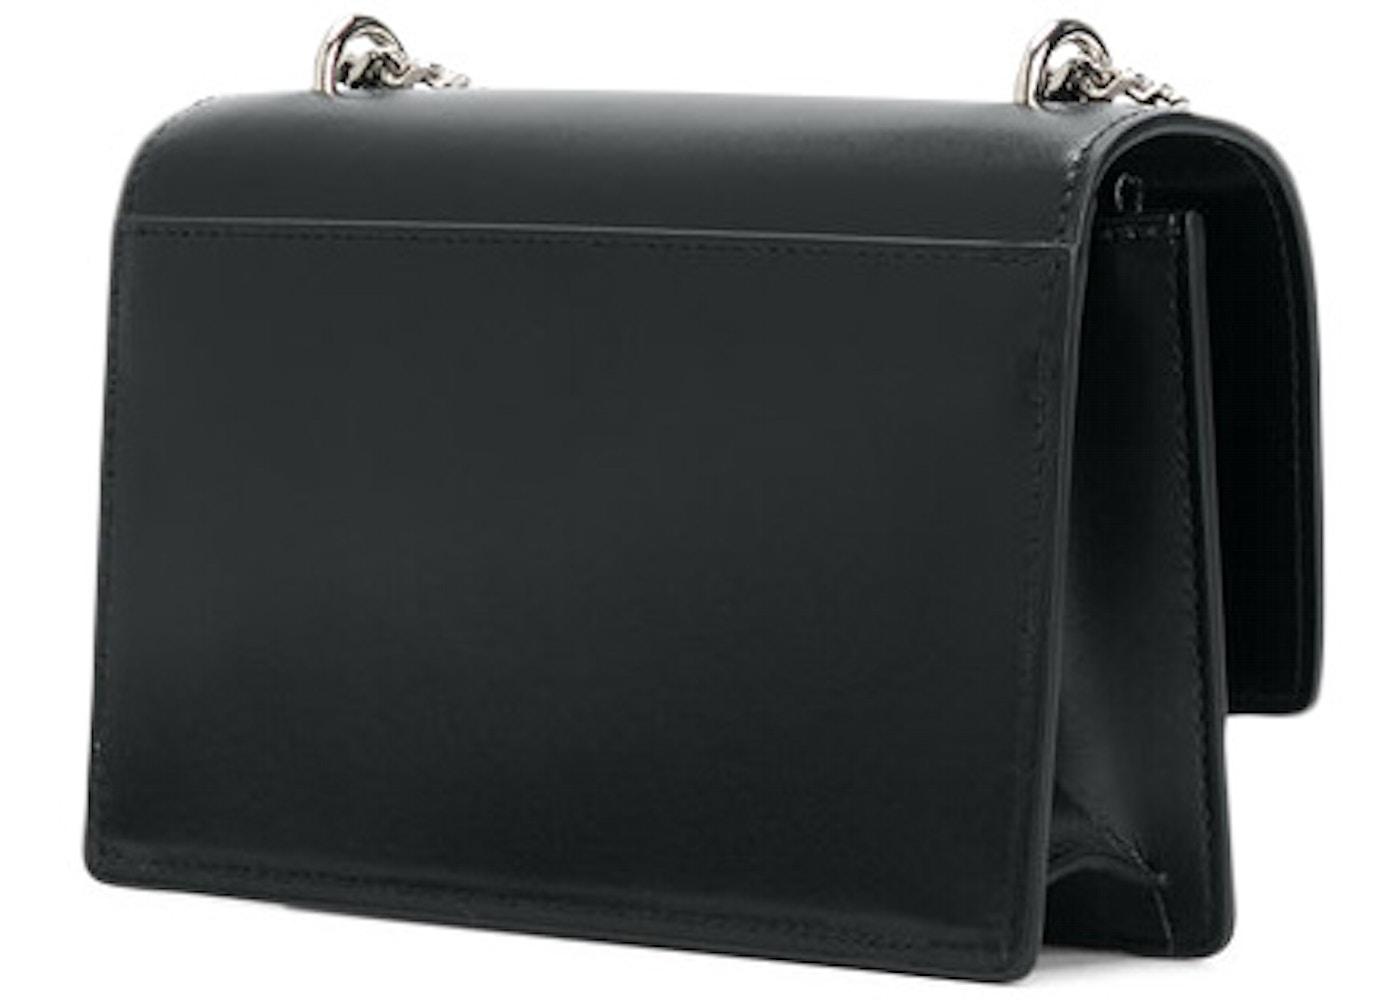 9ff29abfad Buy & Sell Saint Laurent Luxury Handbags